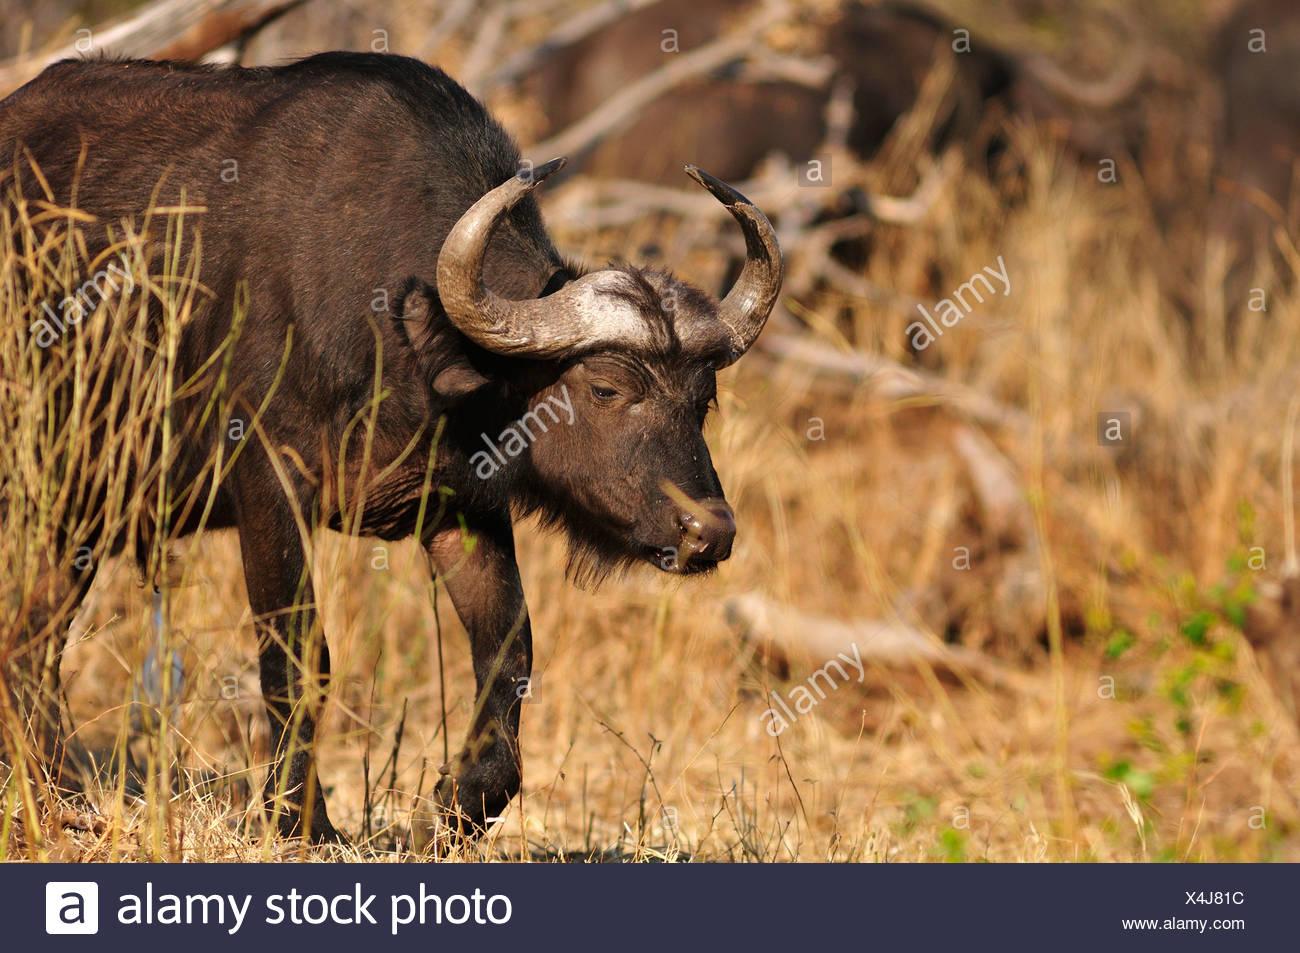 Africa, Botswana, Chobe, National Park, safari, horizontal, wildlife, Buffalo, animal, Syncerus caffer - Stock Image